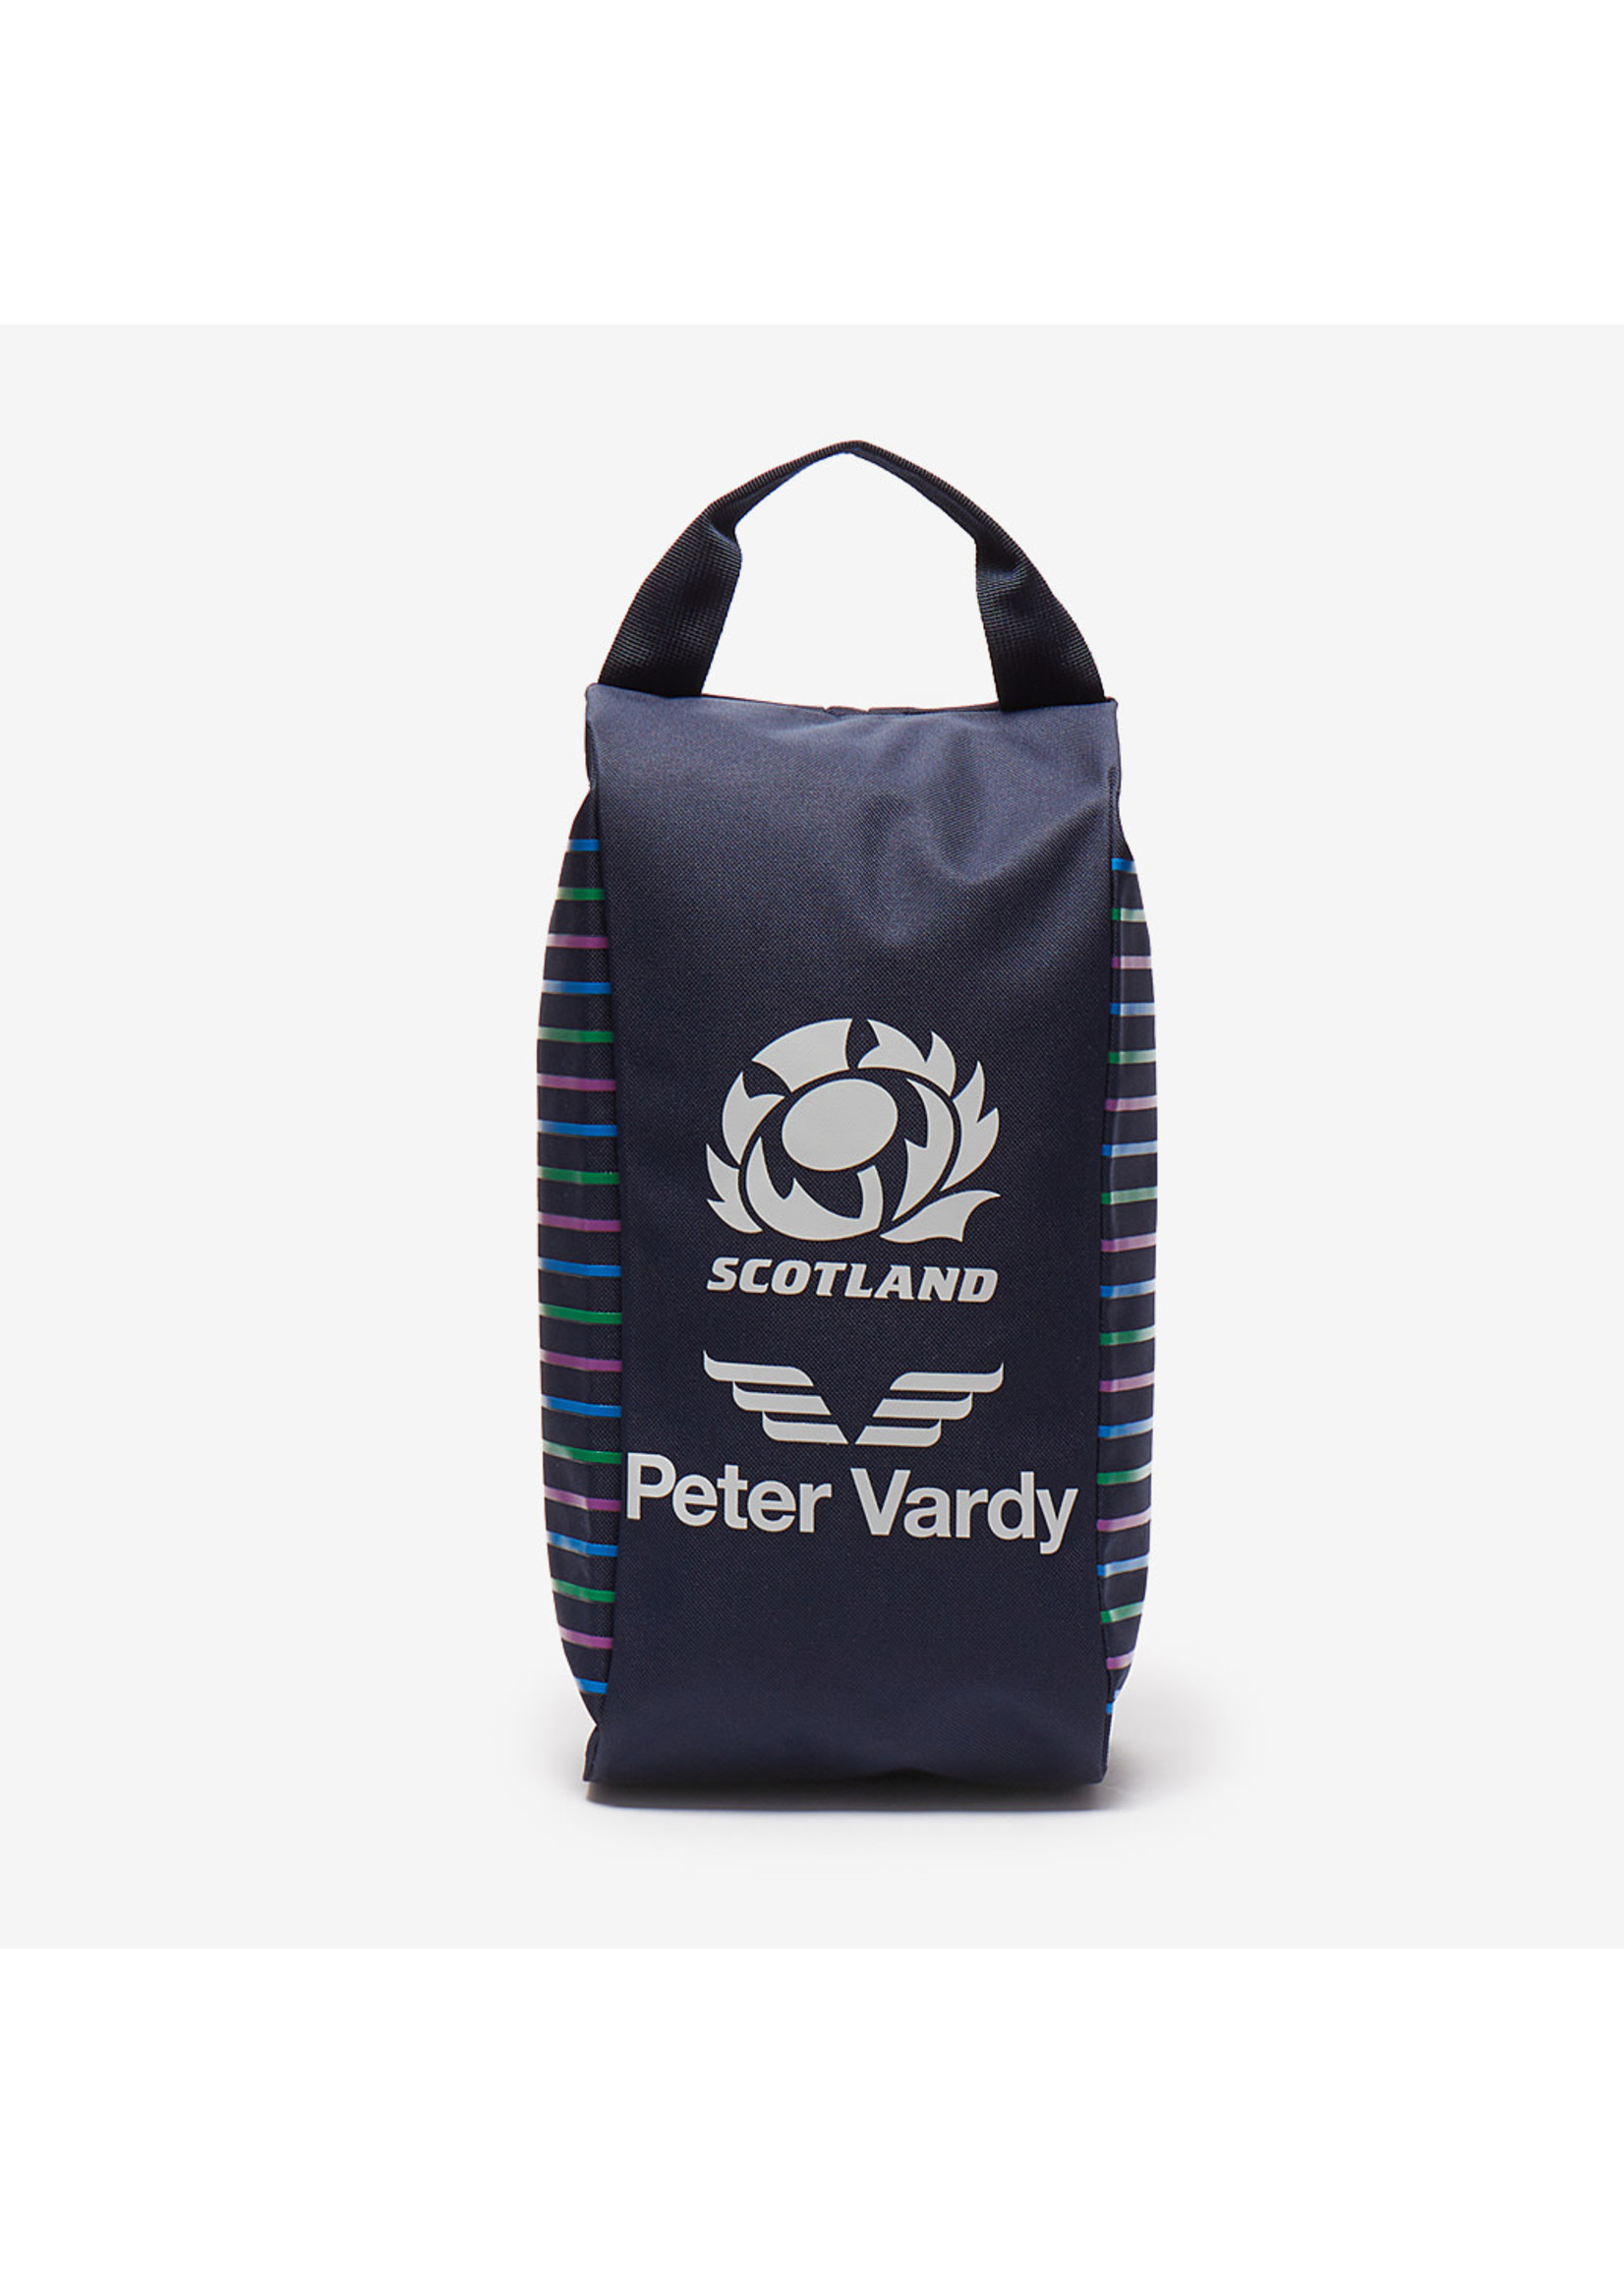 Macron Macron Scotland Rugby - Boot Bag (2021/22)  Navy/Purple/Royal